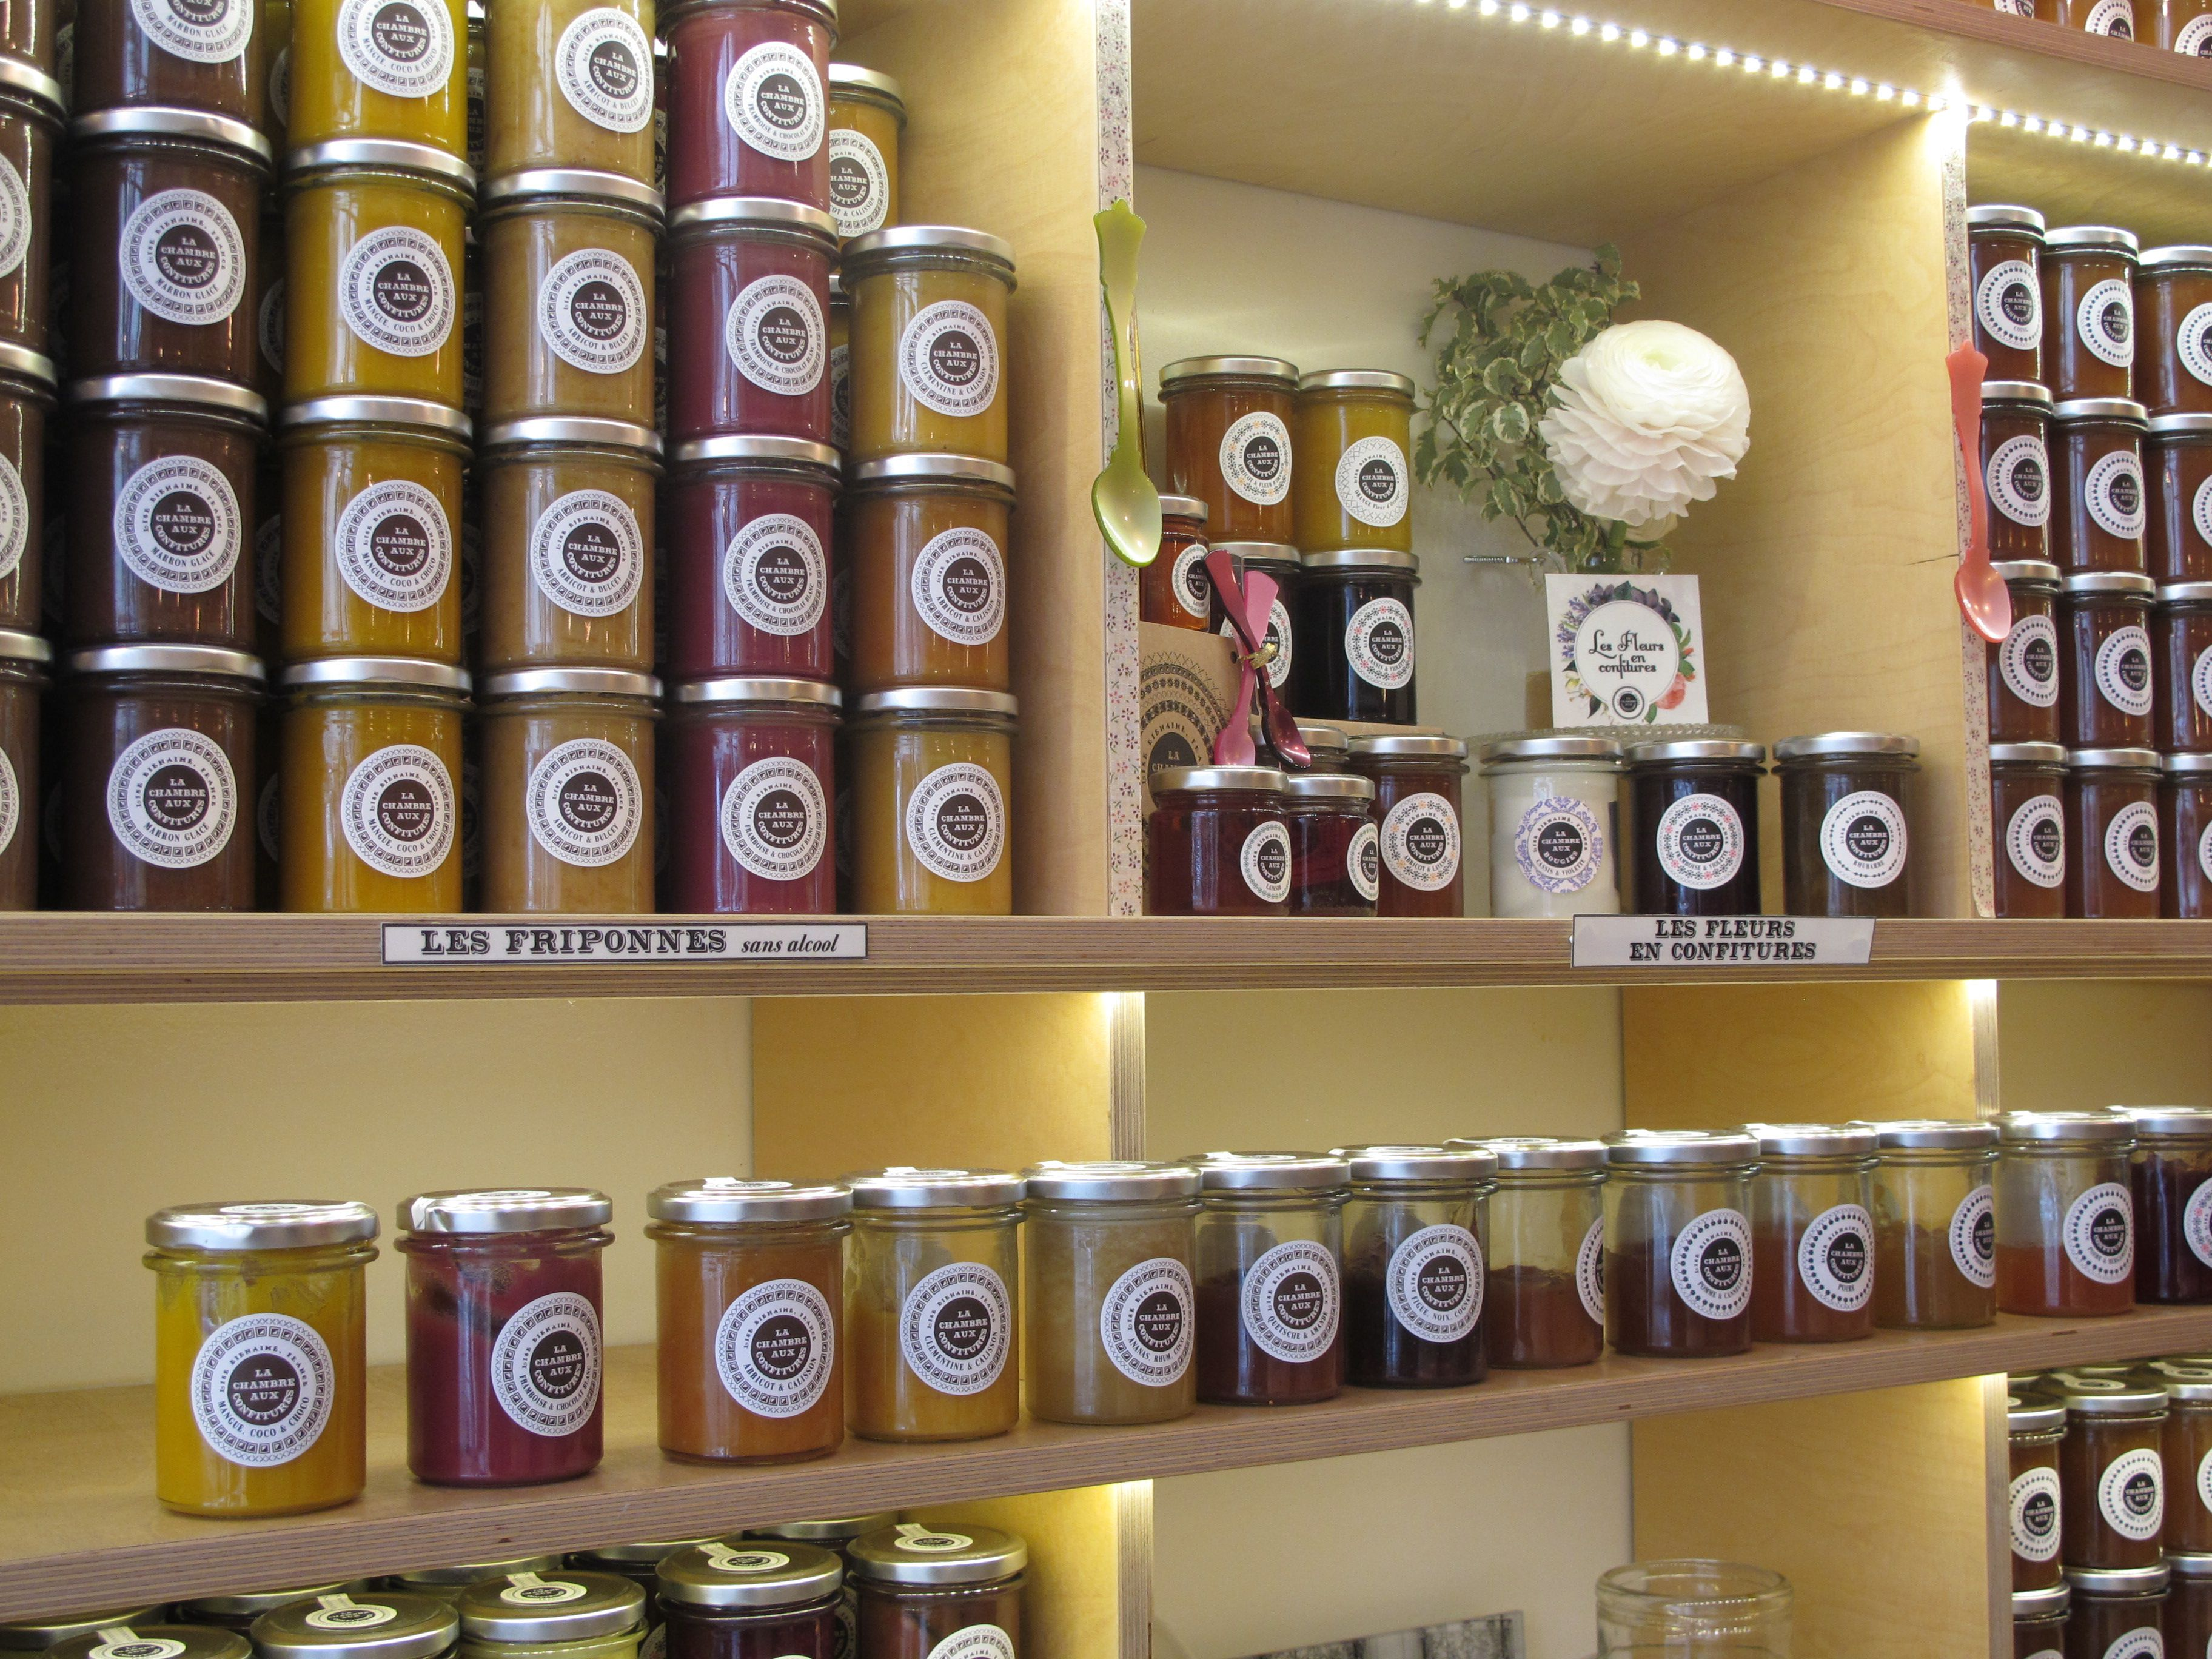 A dizzying array of artisan jams at La chambre aux confitures in Paris